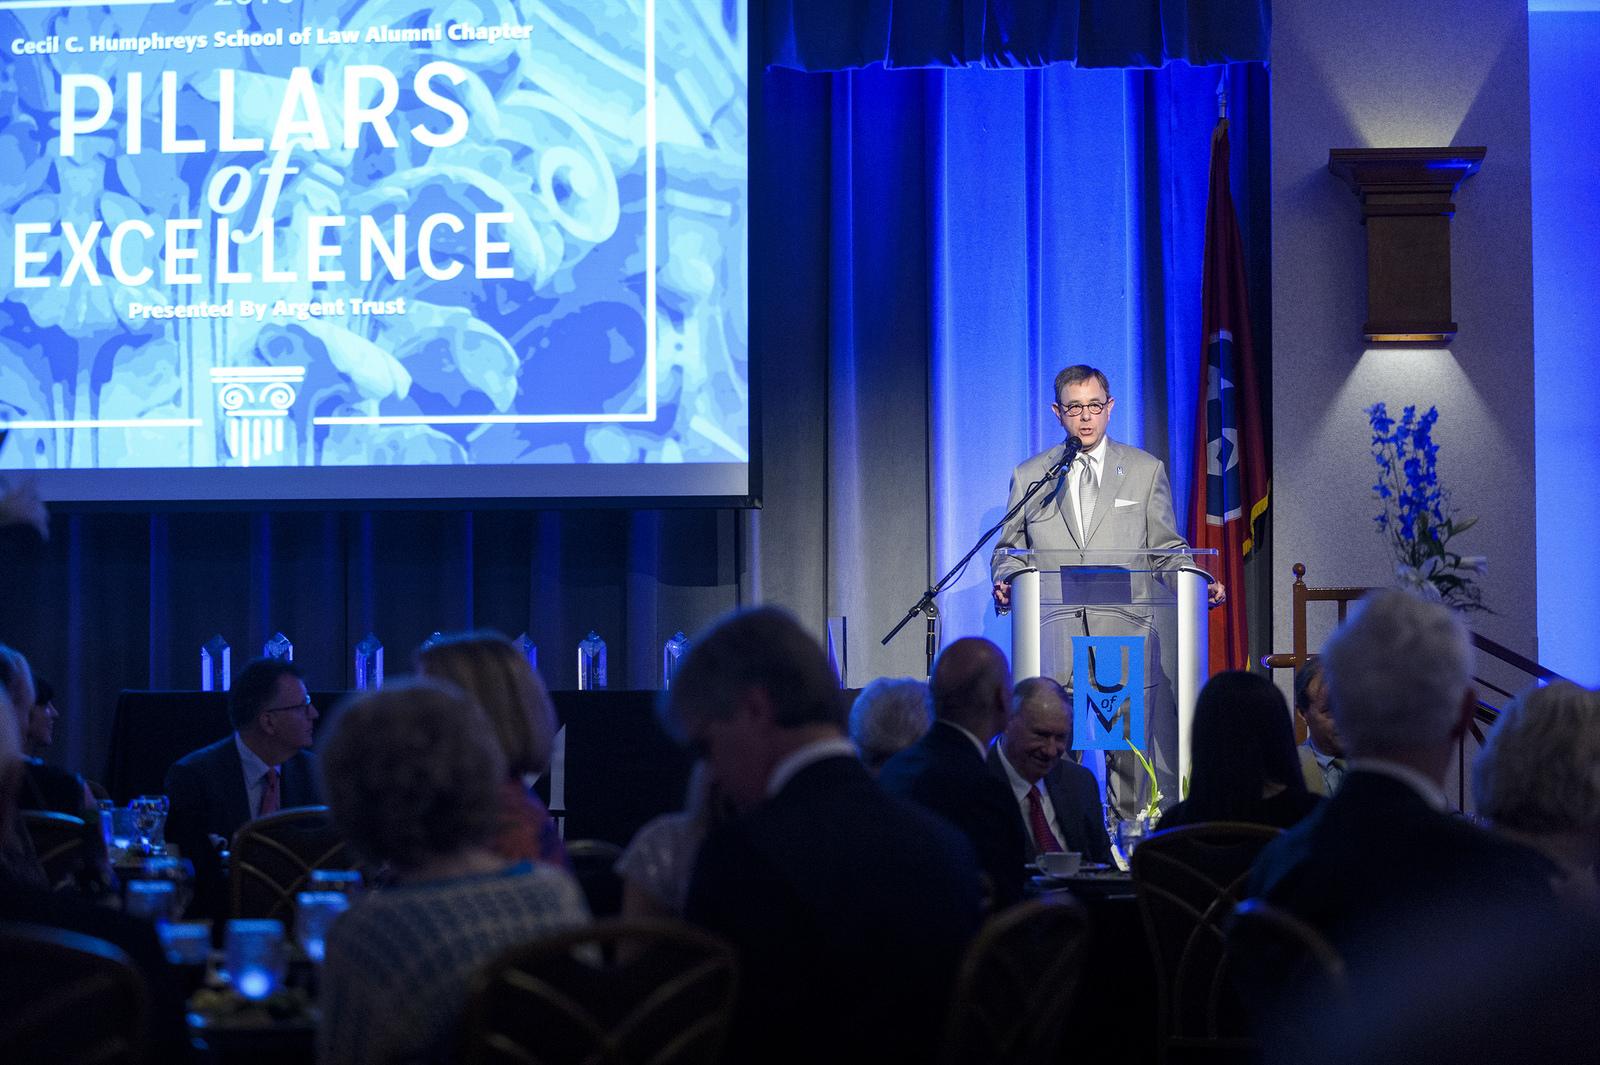 Richard Glassman presenting at podium